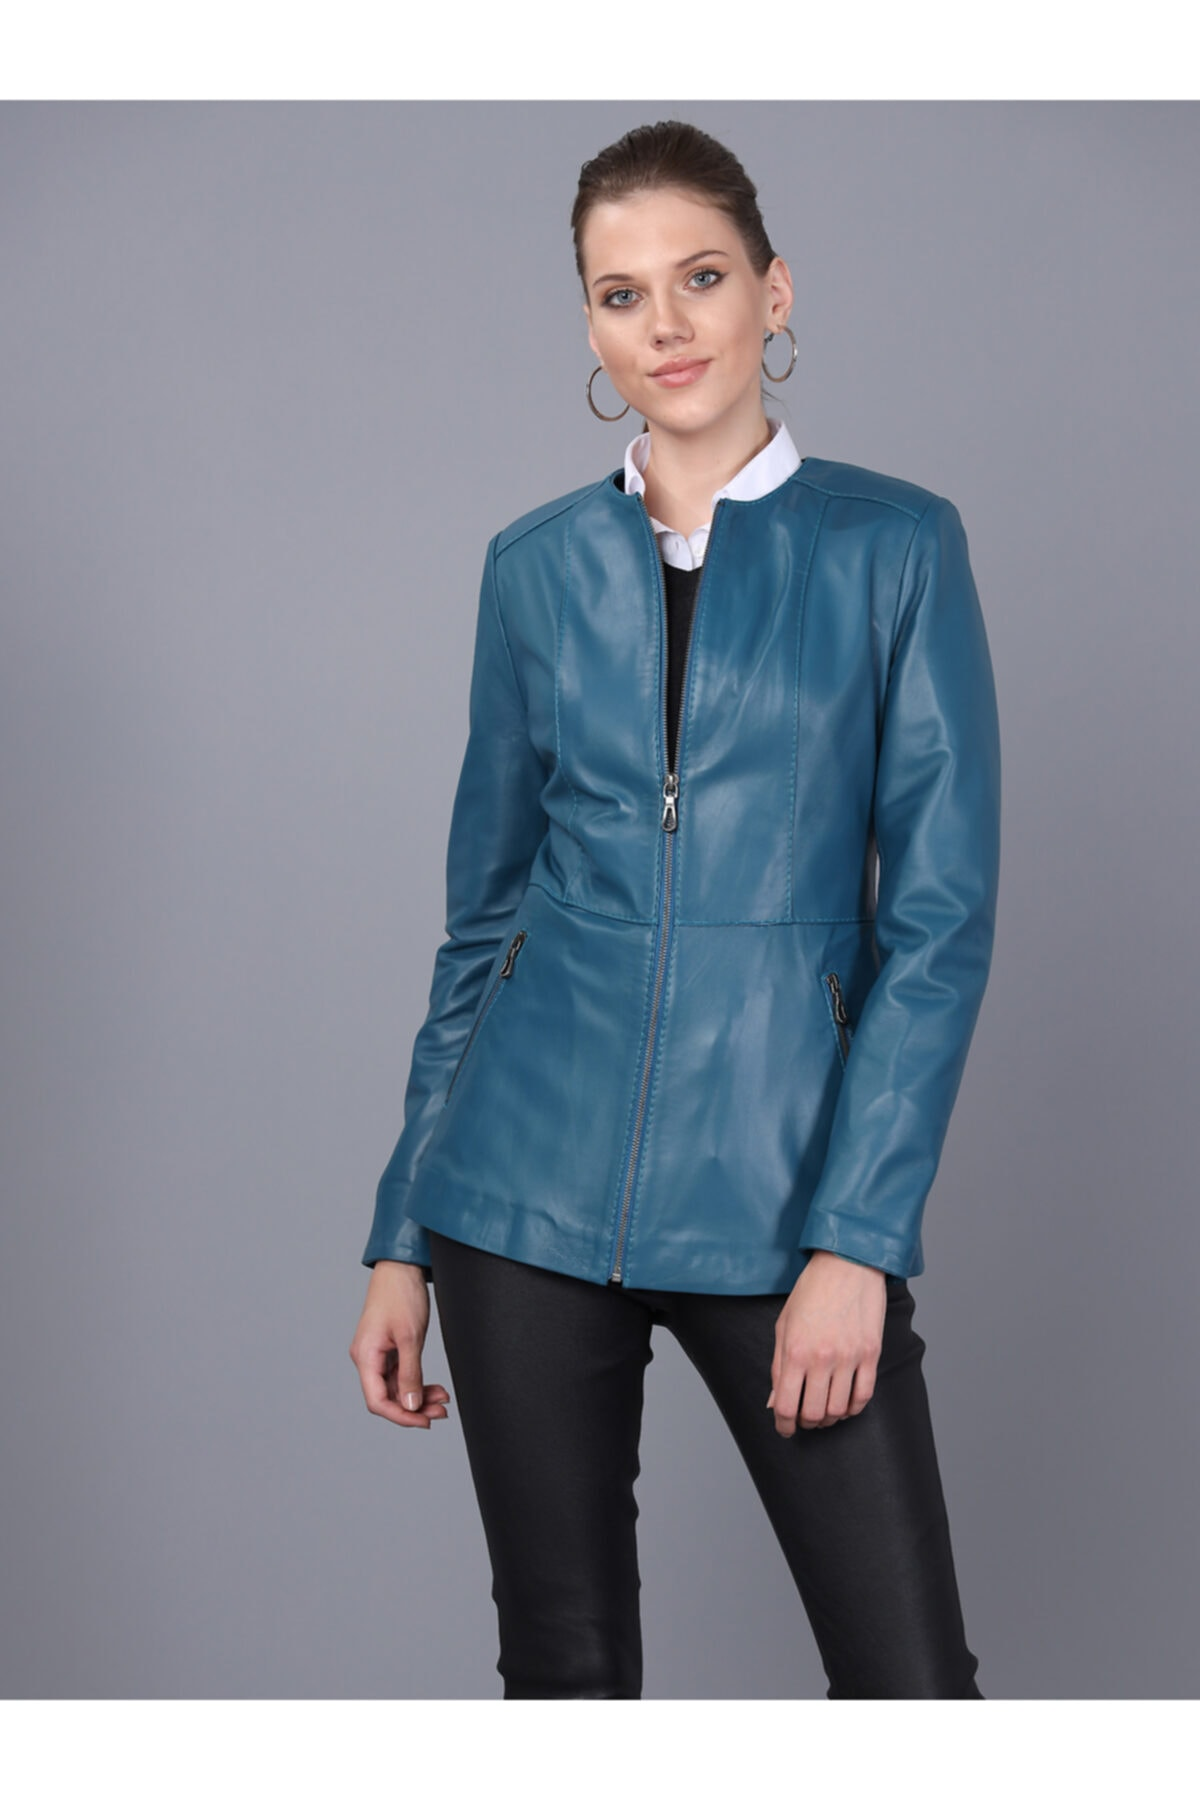 Basics&More Kadın Petrol Mavi Deri Ceket Bm03 2